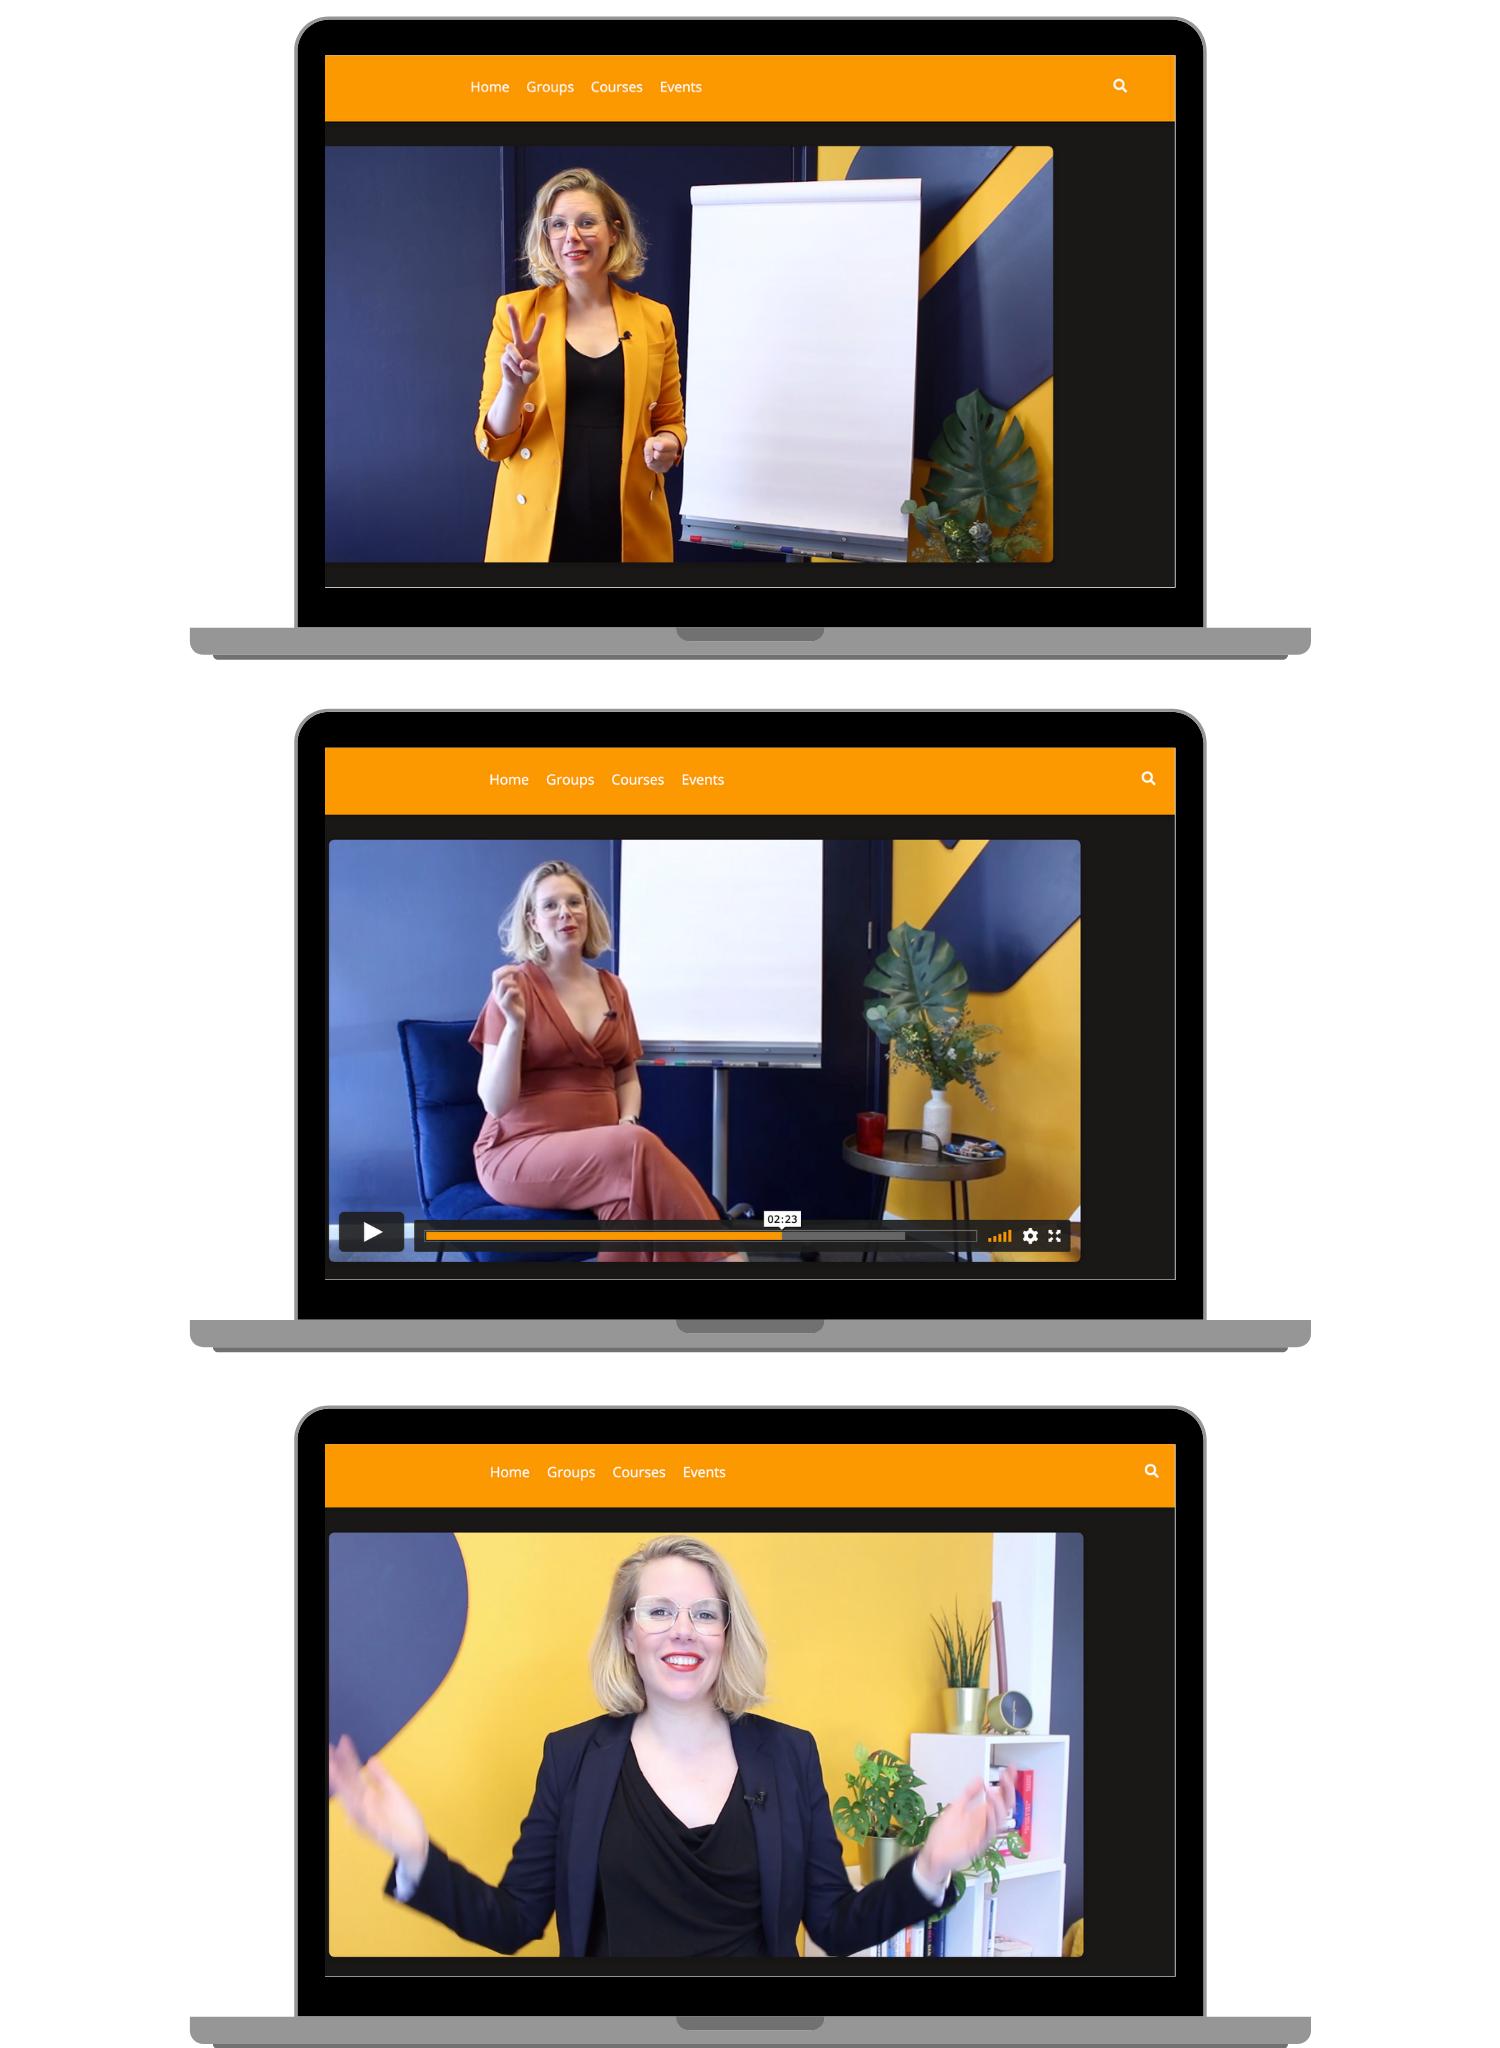 Stage Heroes website image online presentation training online presenting